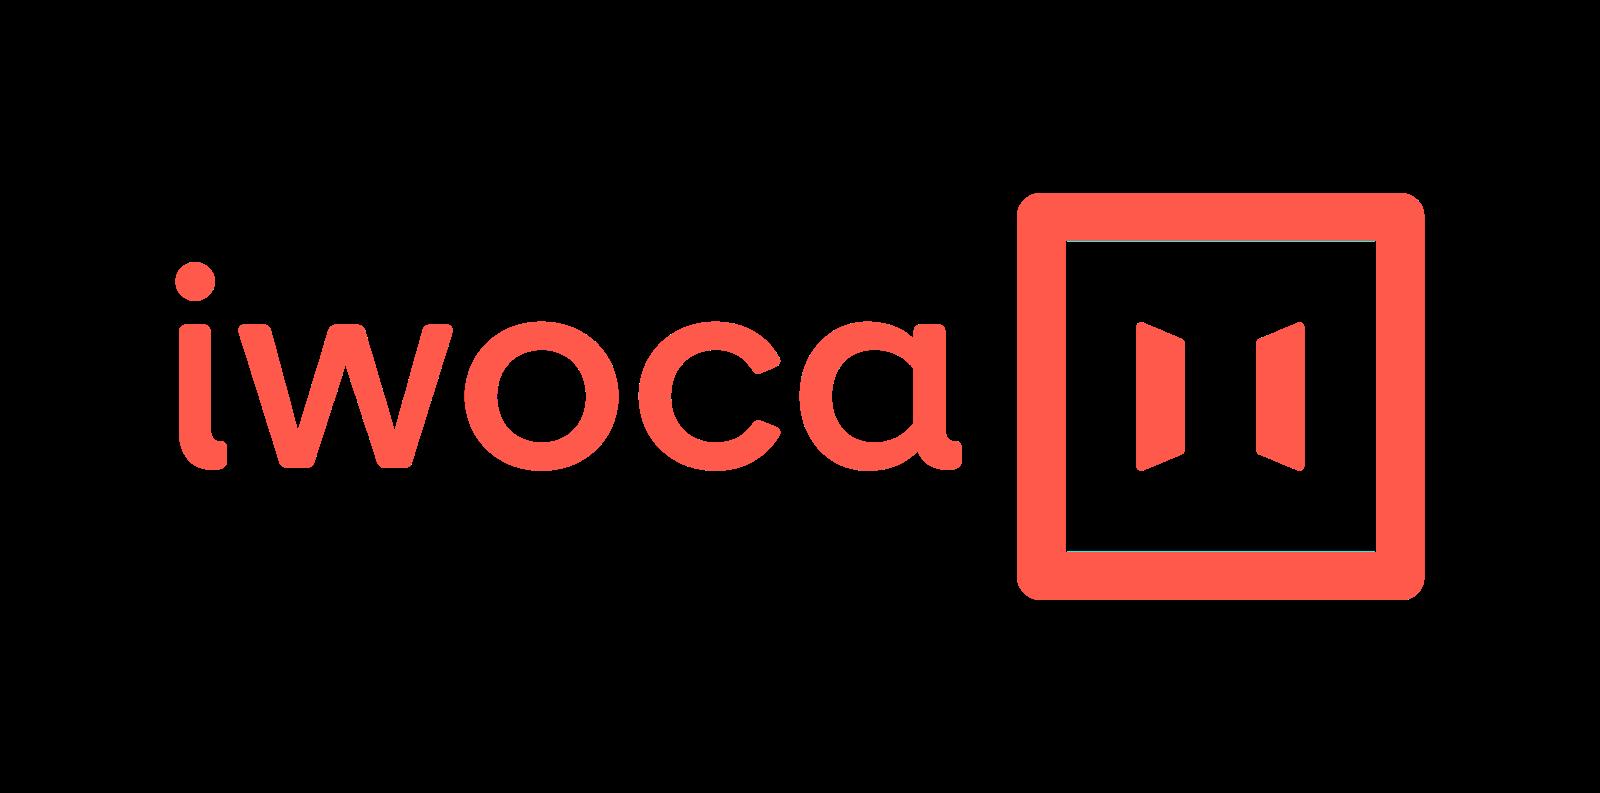 iwoca approved for accreditation under Coronavirus Business Interruption Loan Scheme (CBILS)